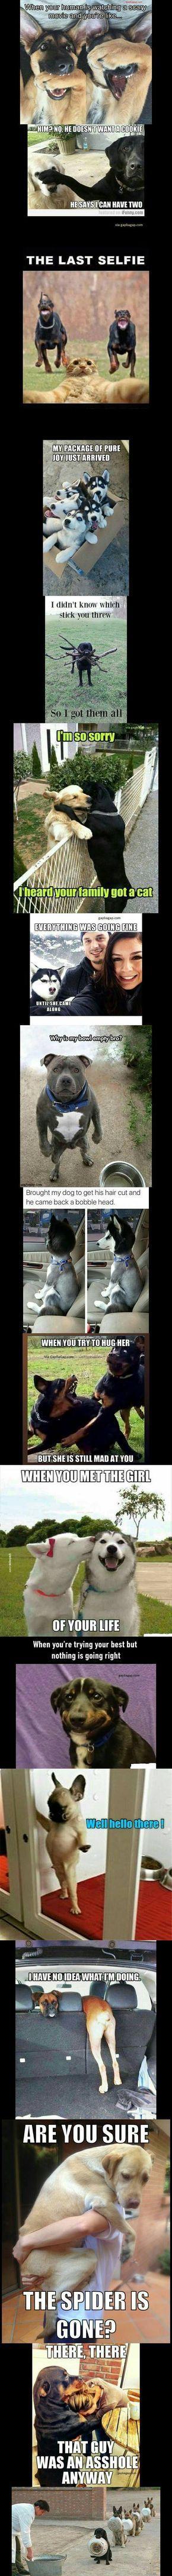 Top 18 Funniest Jokes ft. Funny Dogs #funnydogs